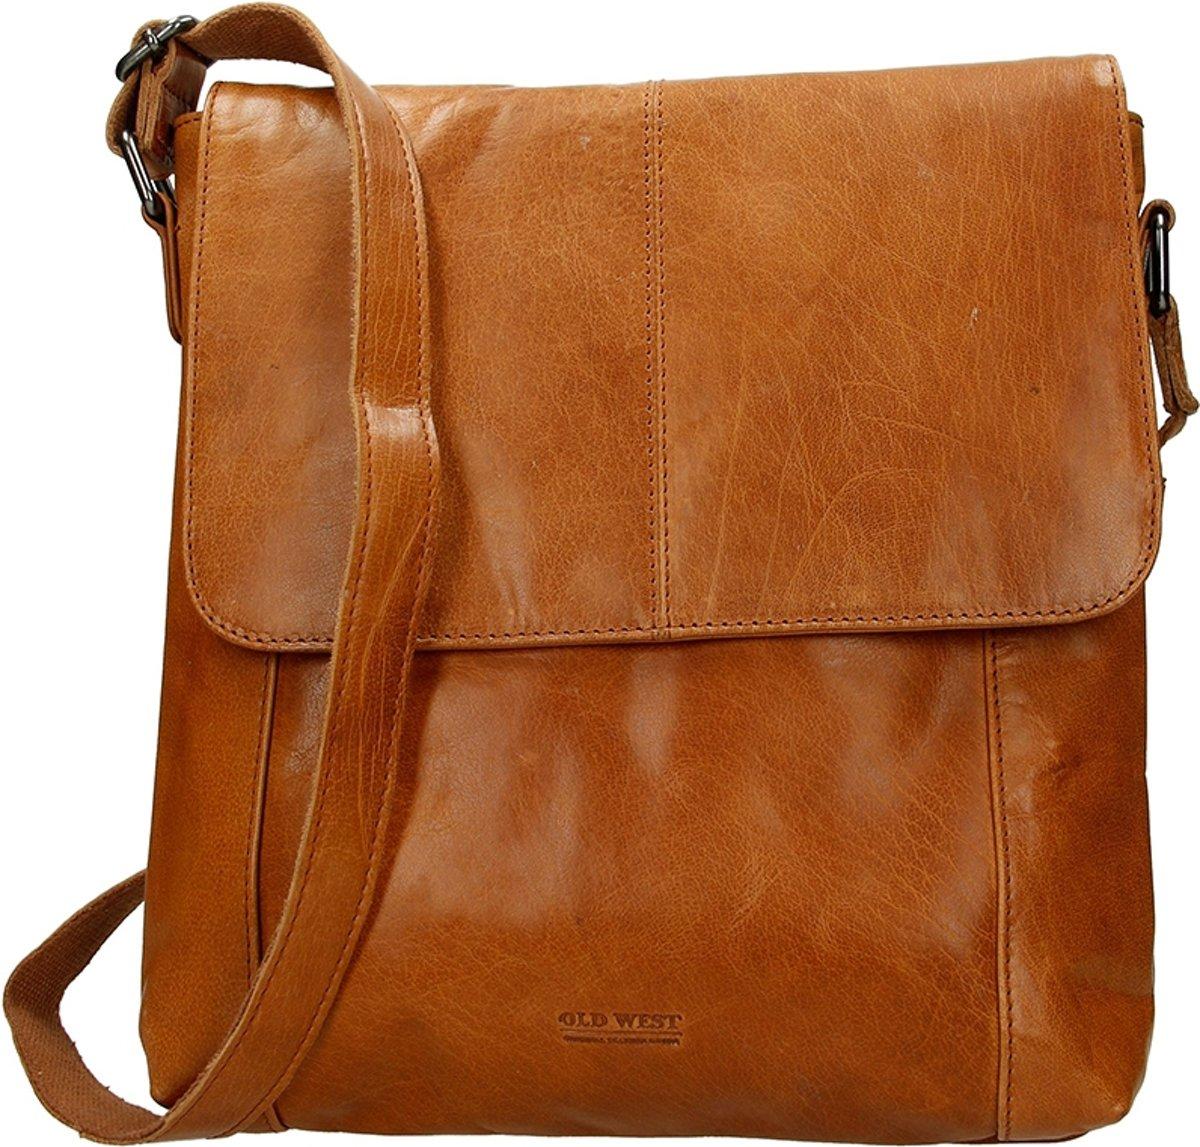 Https Nl P Dorstaagh Sweater Unisex Grijs 134 146 Kangaroo 2 Colors Kingdom Mesenger Bag M L Xl 9200000091619005